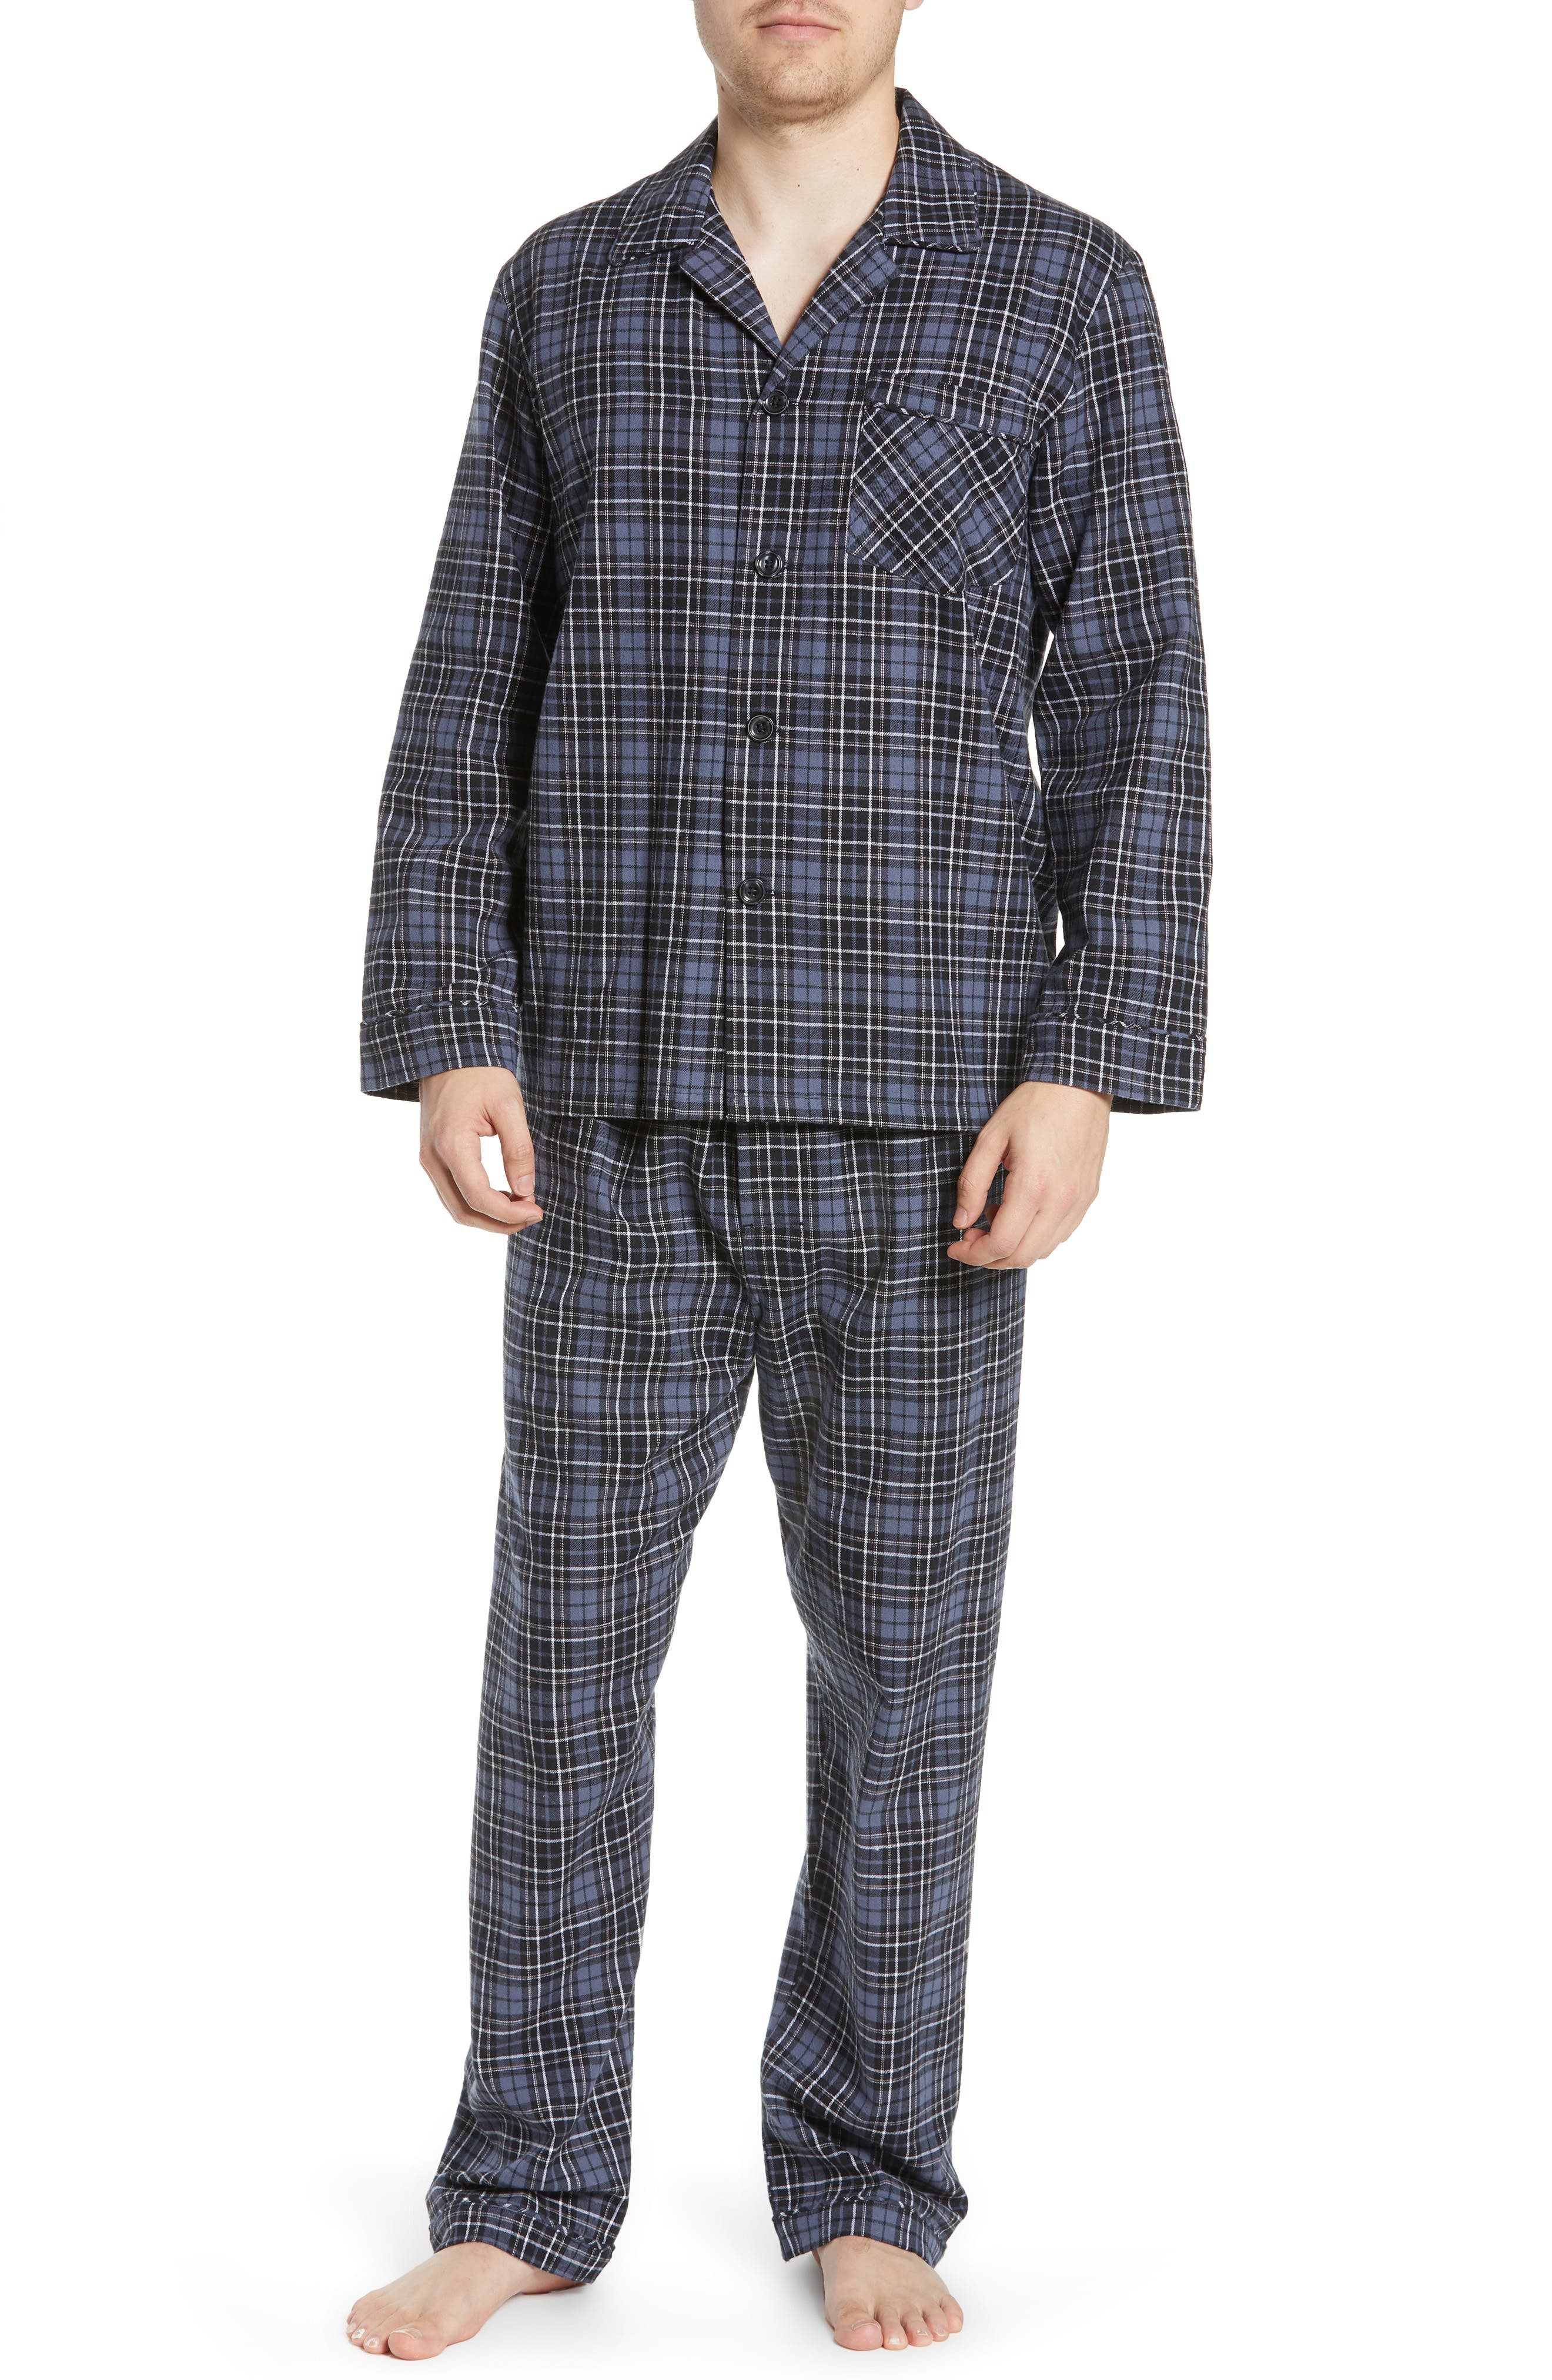 MAJESTIC INTERNATIONAL True Match Flannel Pajamas, Main, color, 001